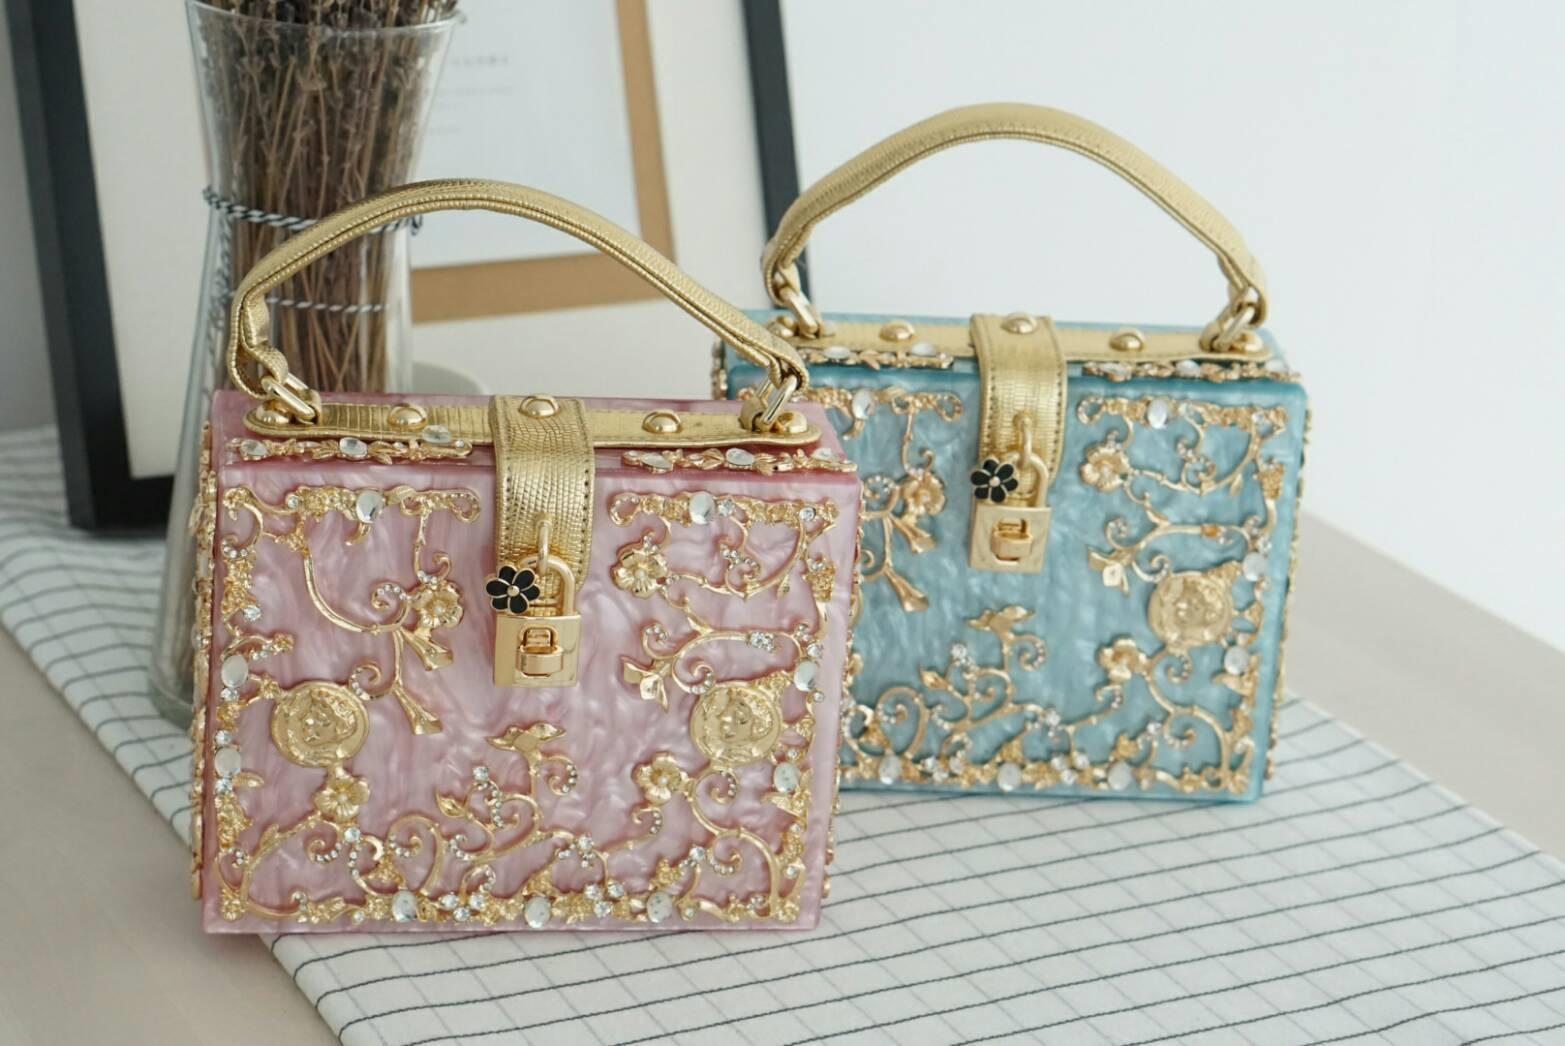 Dolce & gabbana gold diamond acylic luxury handbag